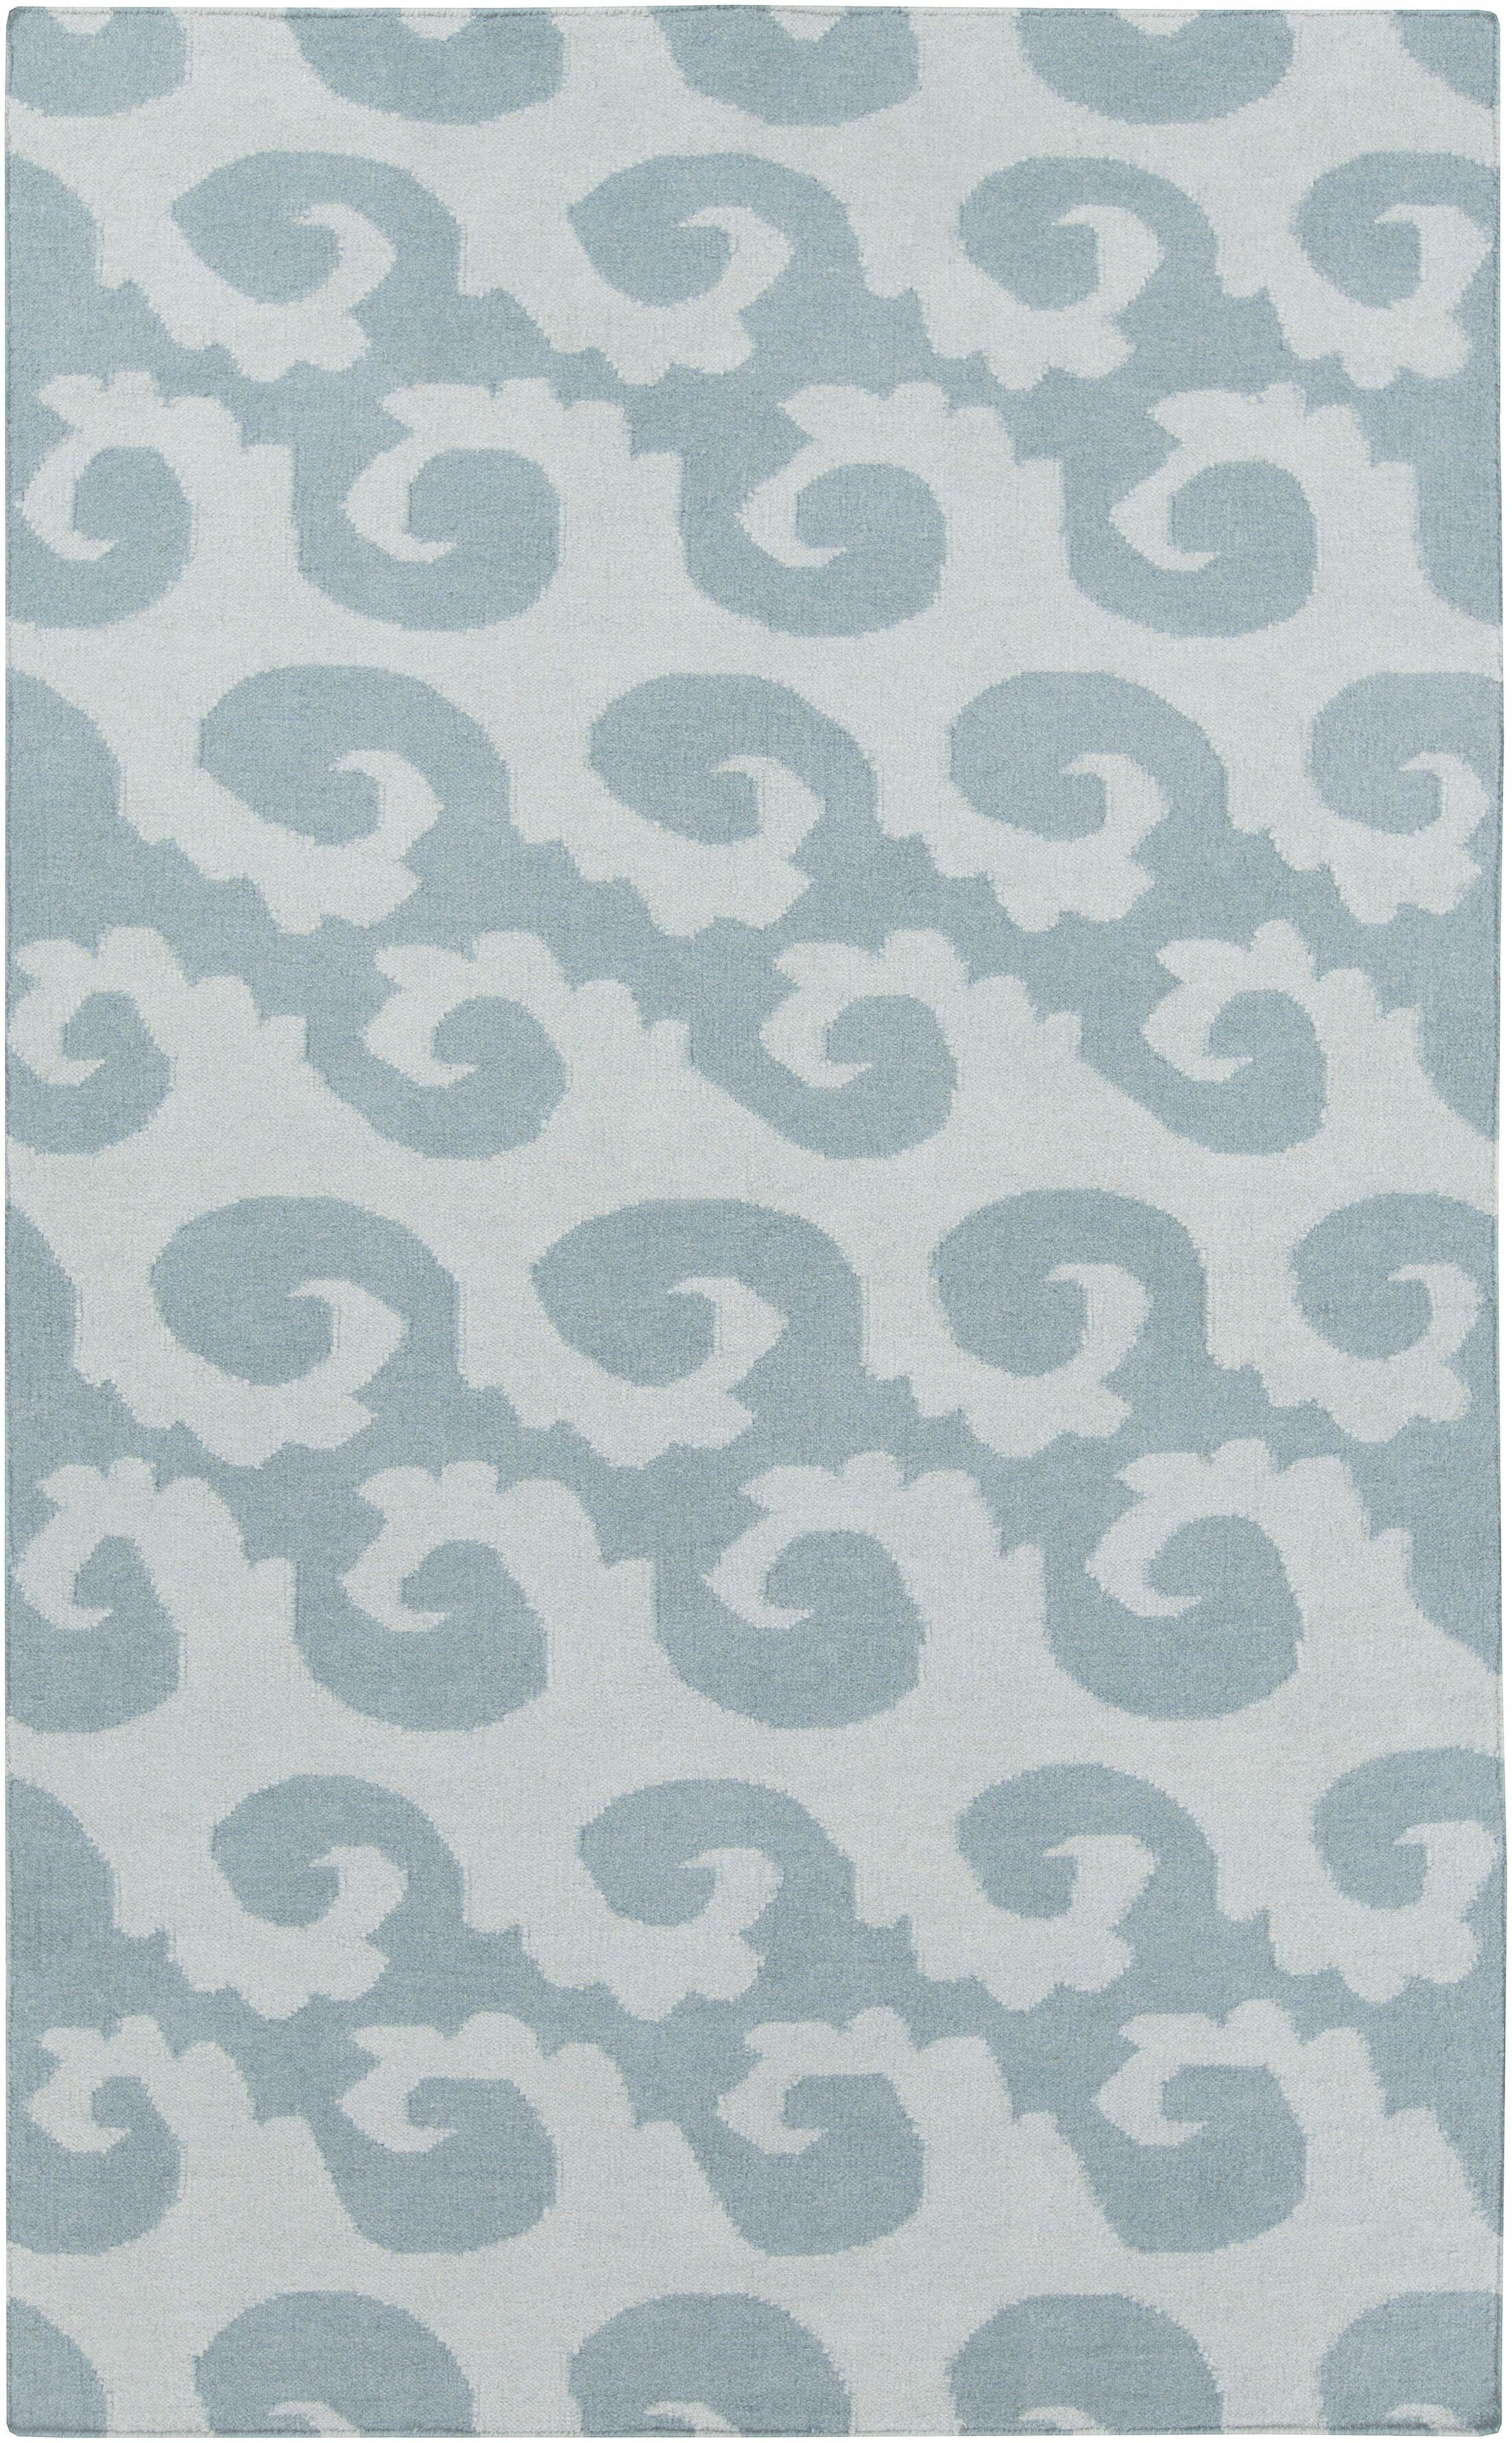 Byington Coastal Hand-Woven Wool Sky Blue Area Rug Rug Size: Rectangle 5' x 8'